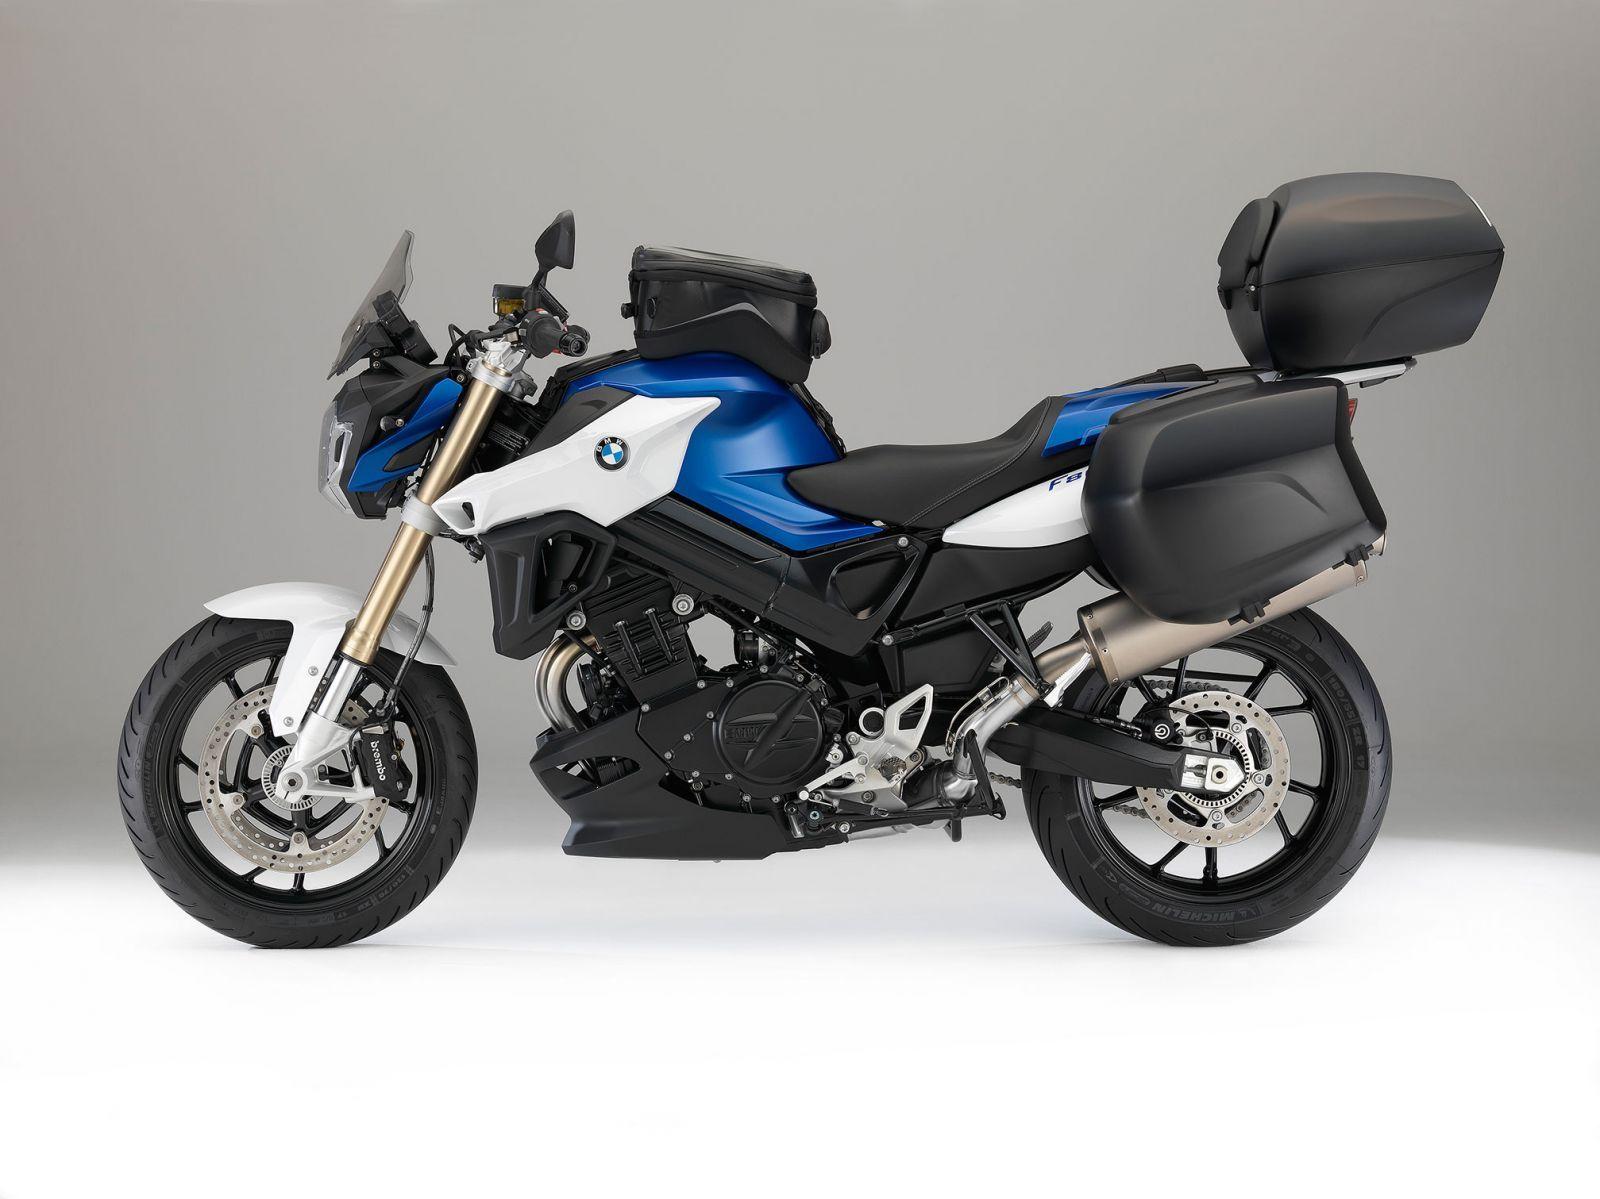 magasin de motos marseille occasion moto moto scooter motos d 39 occasion. Black Bedroom Furniture Sets. Home Design Ideas